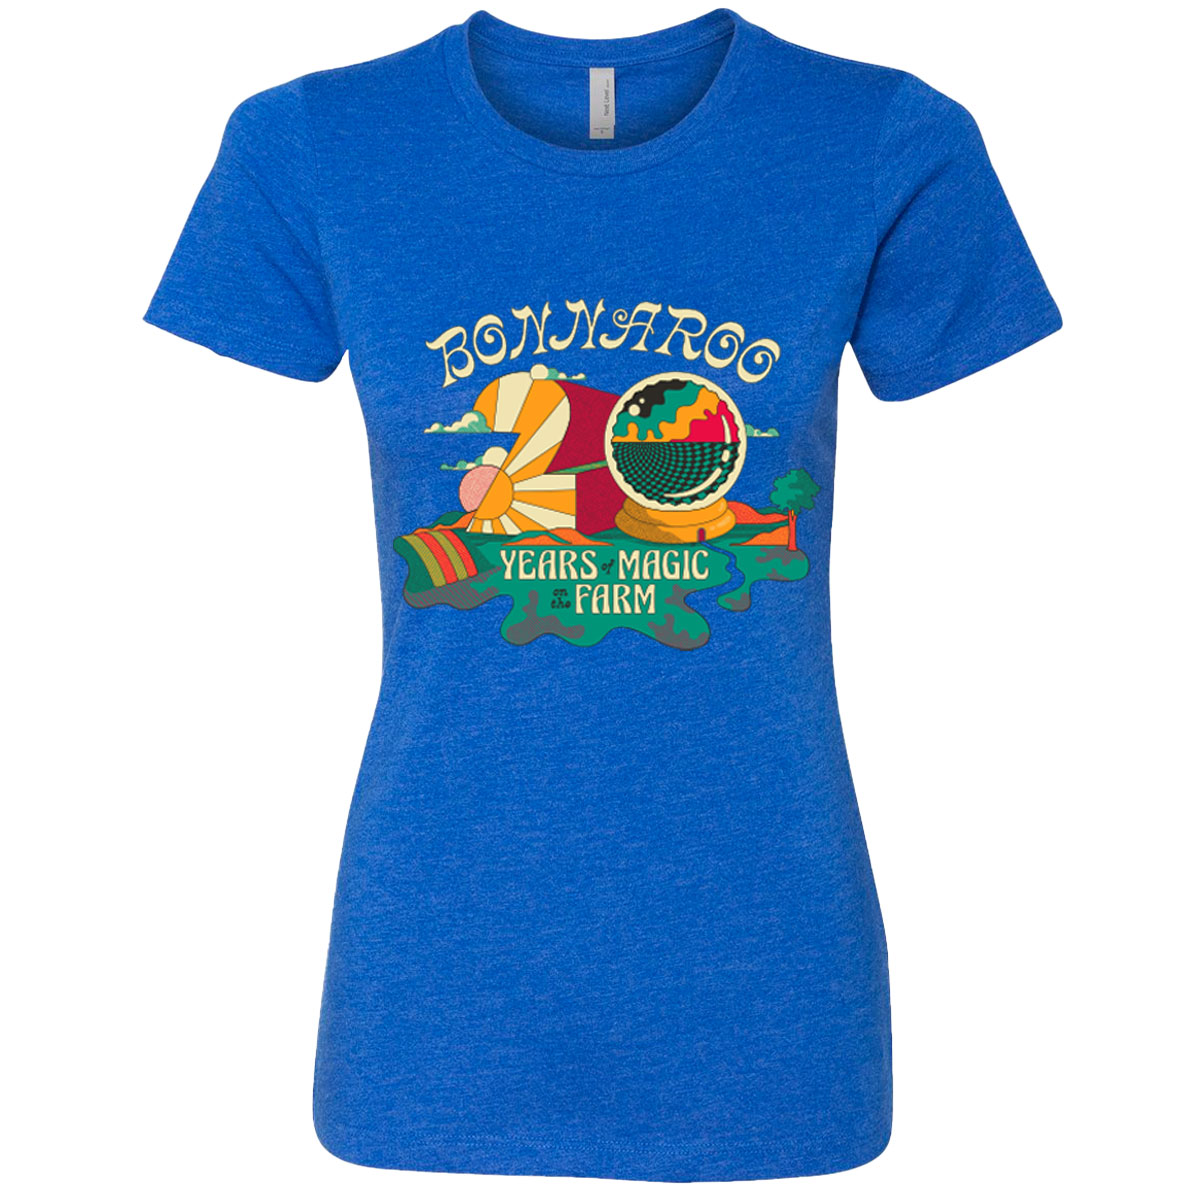 Bonnaroo 2021 Twenty Years of Magic Ladies Event Tee